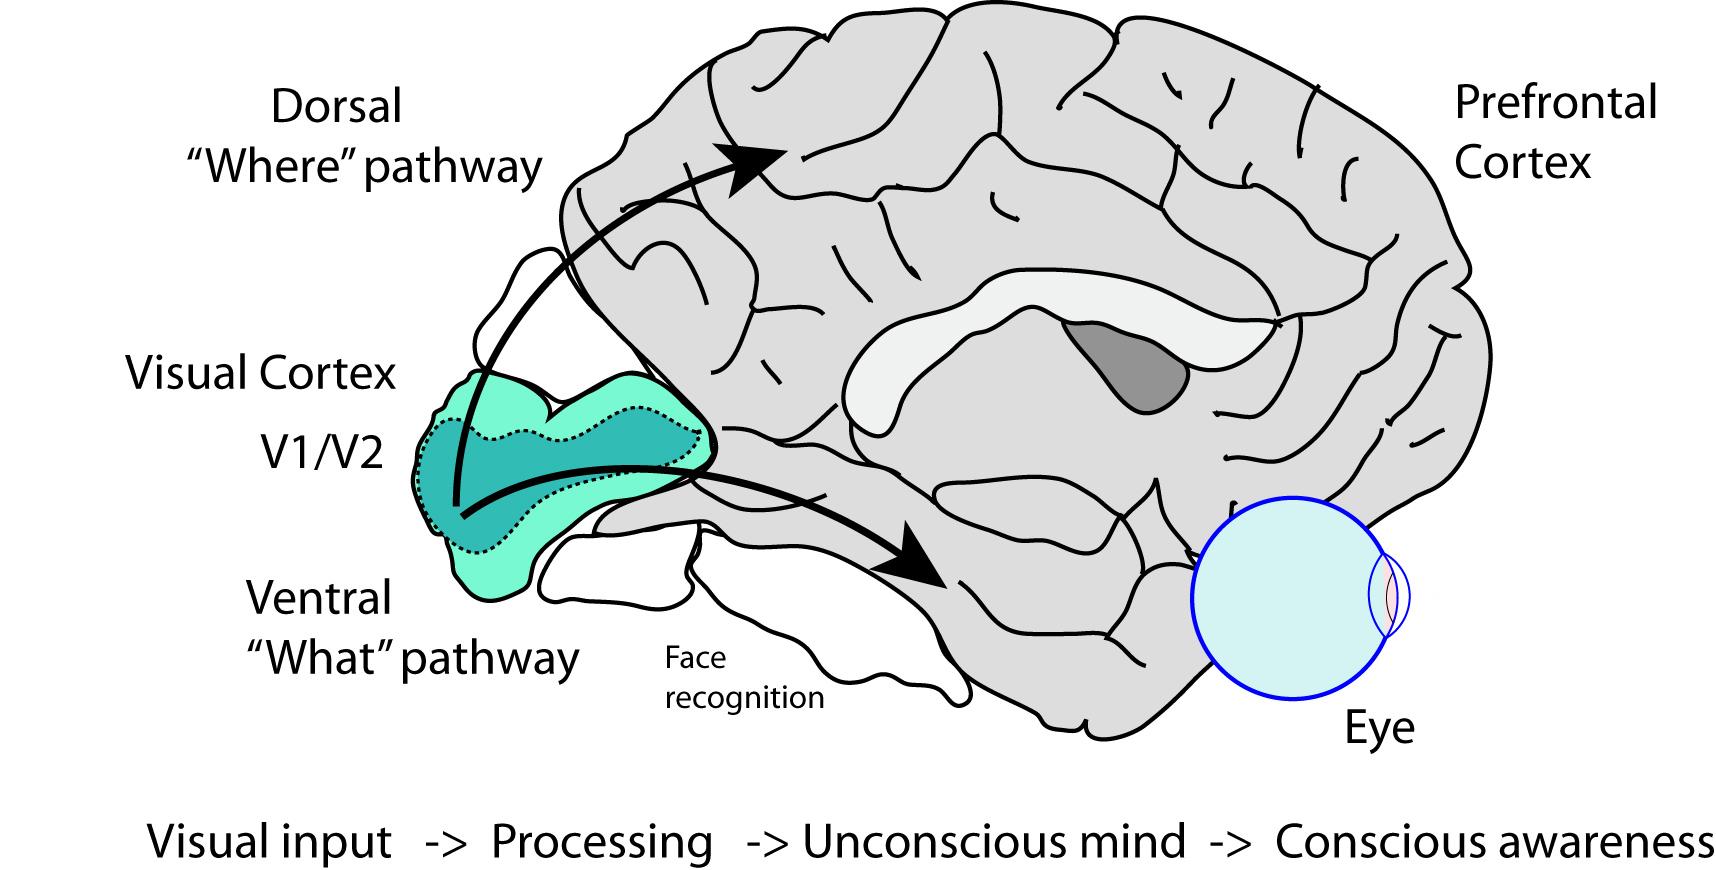 visual cortex | Cogito ergo sum |Visual Cortex